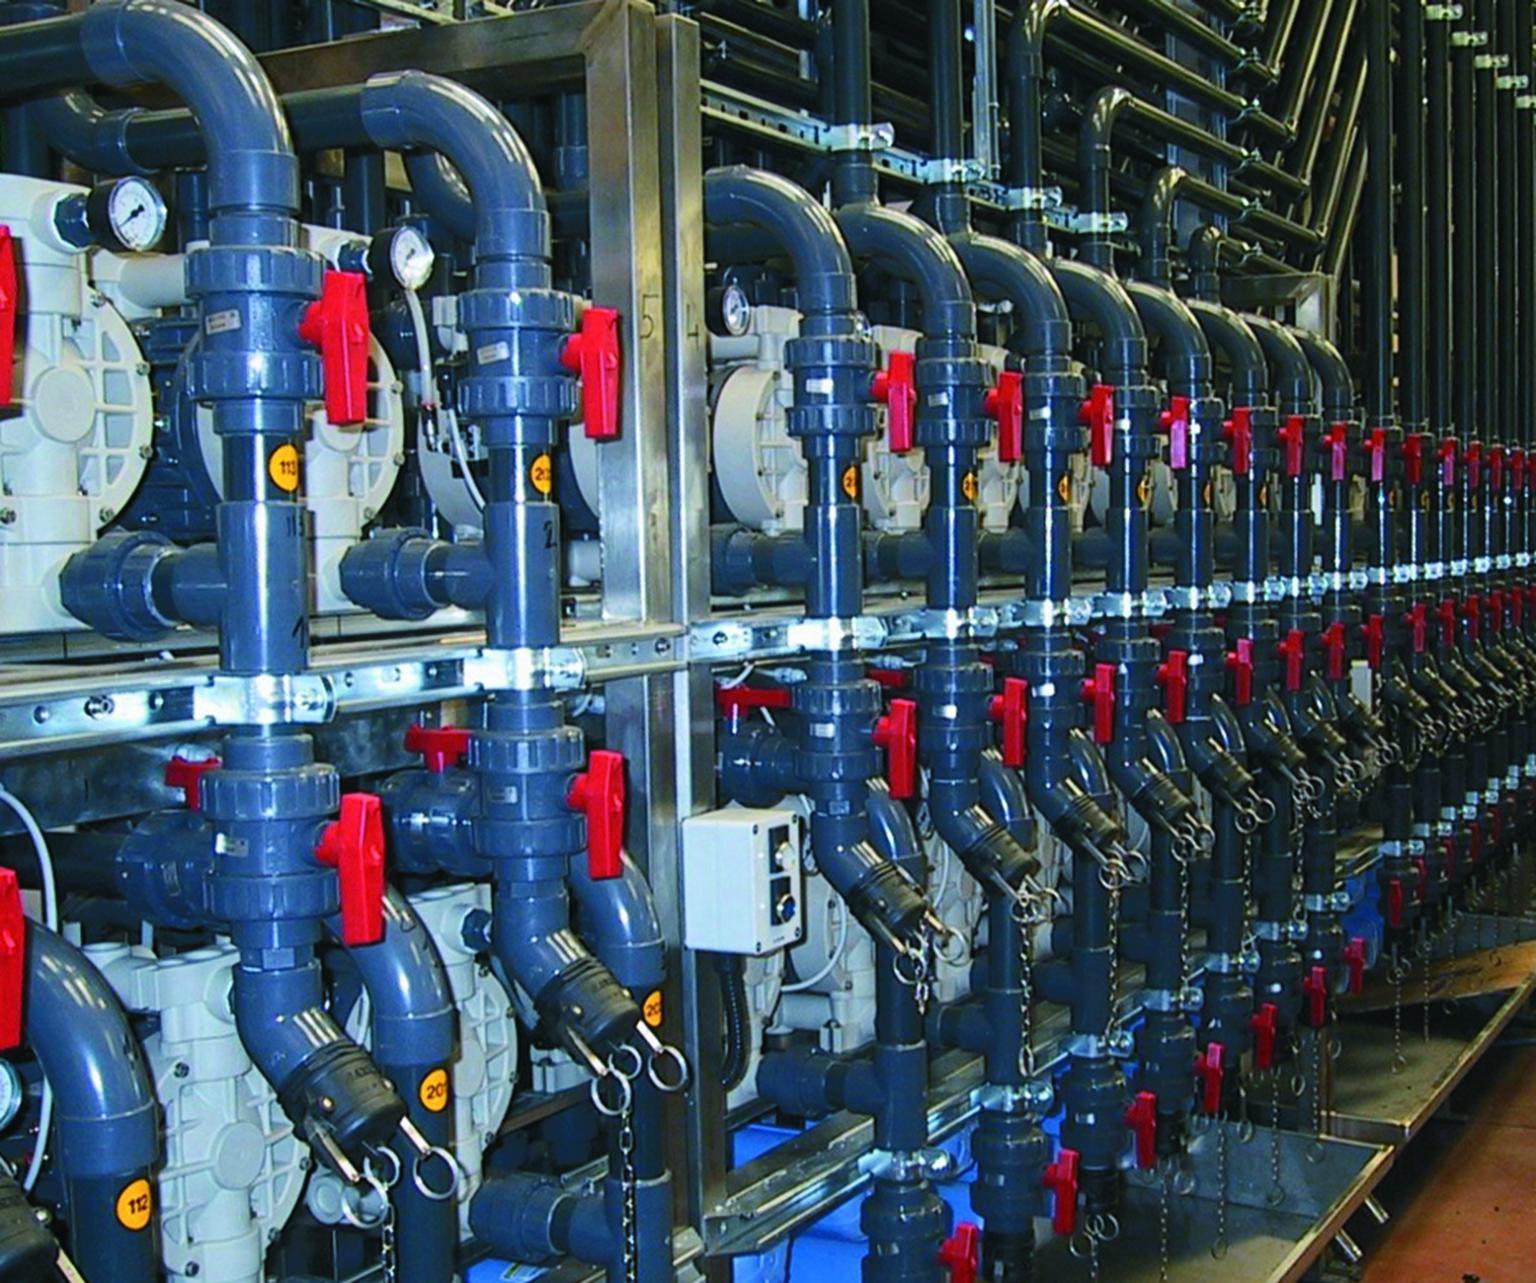 Pump line-up serving several processes